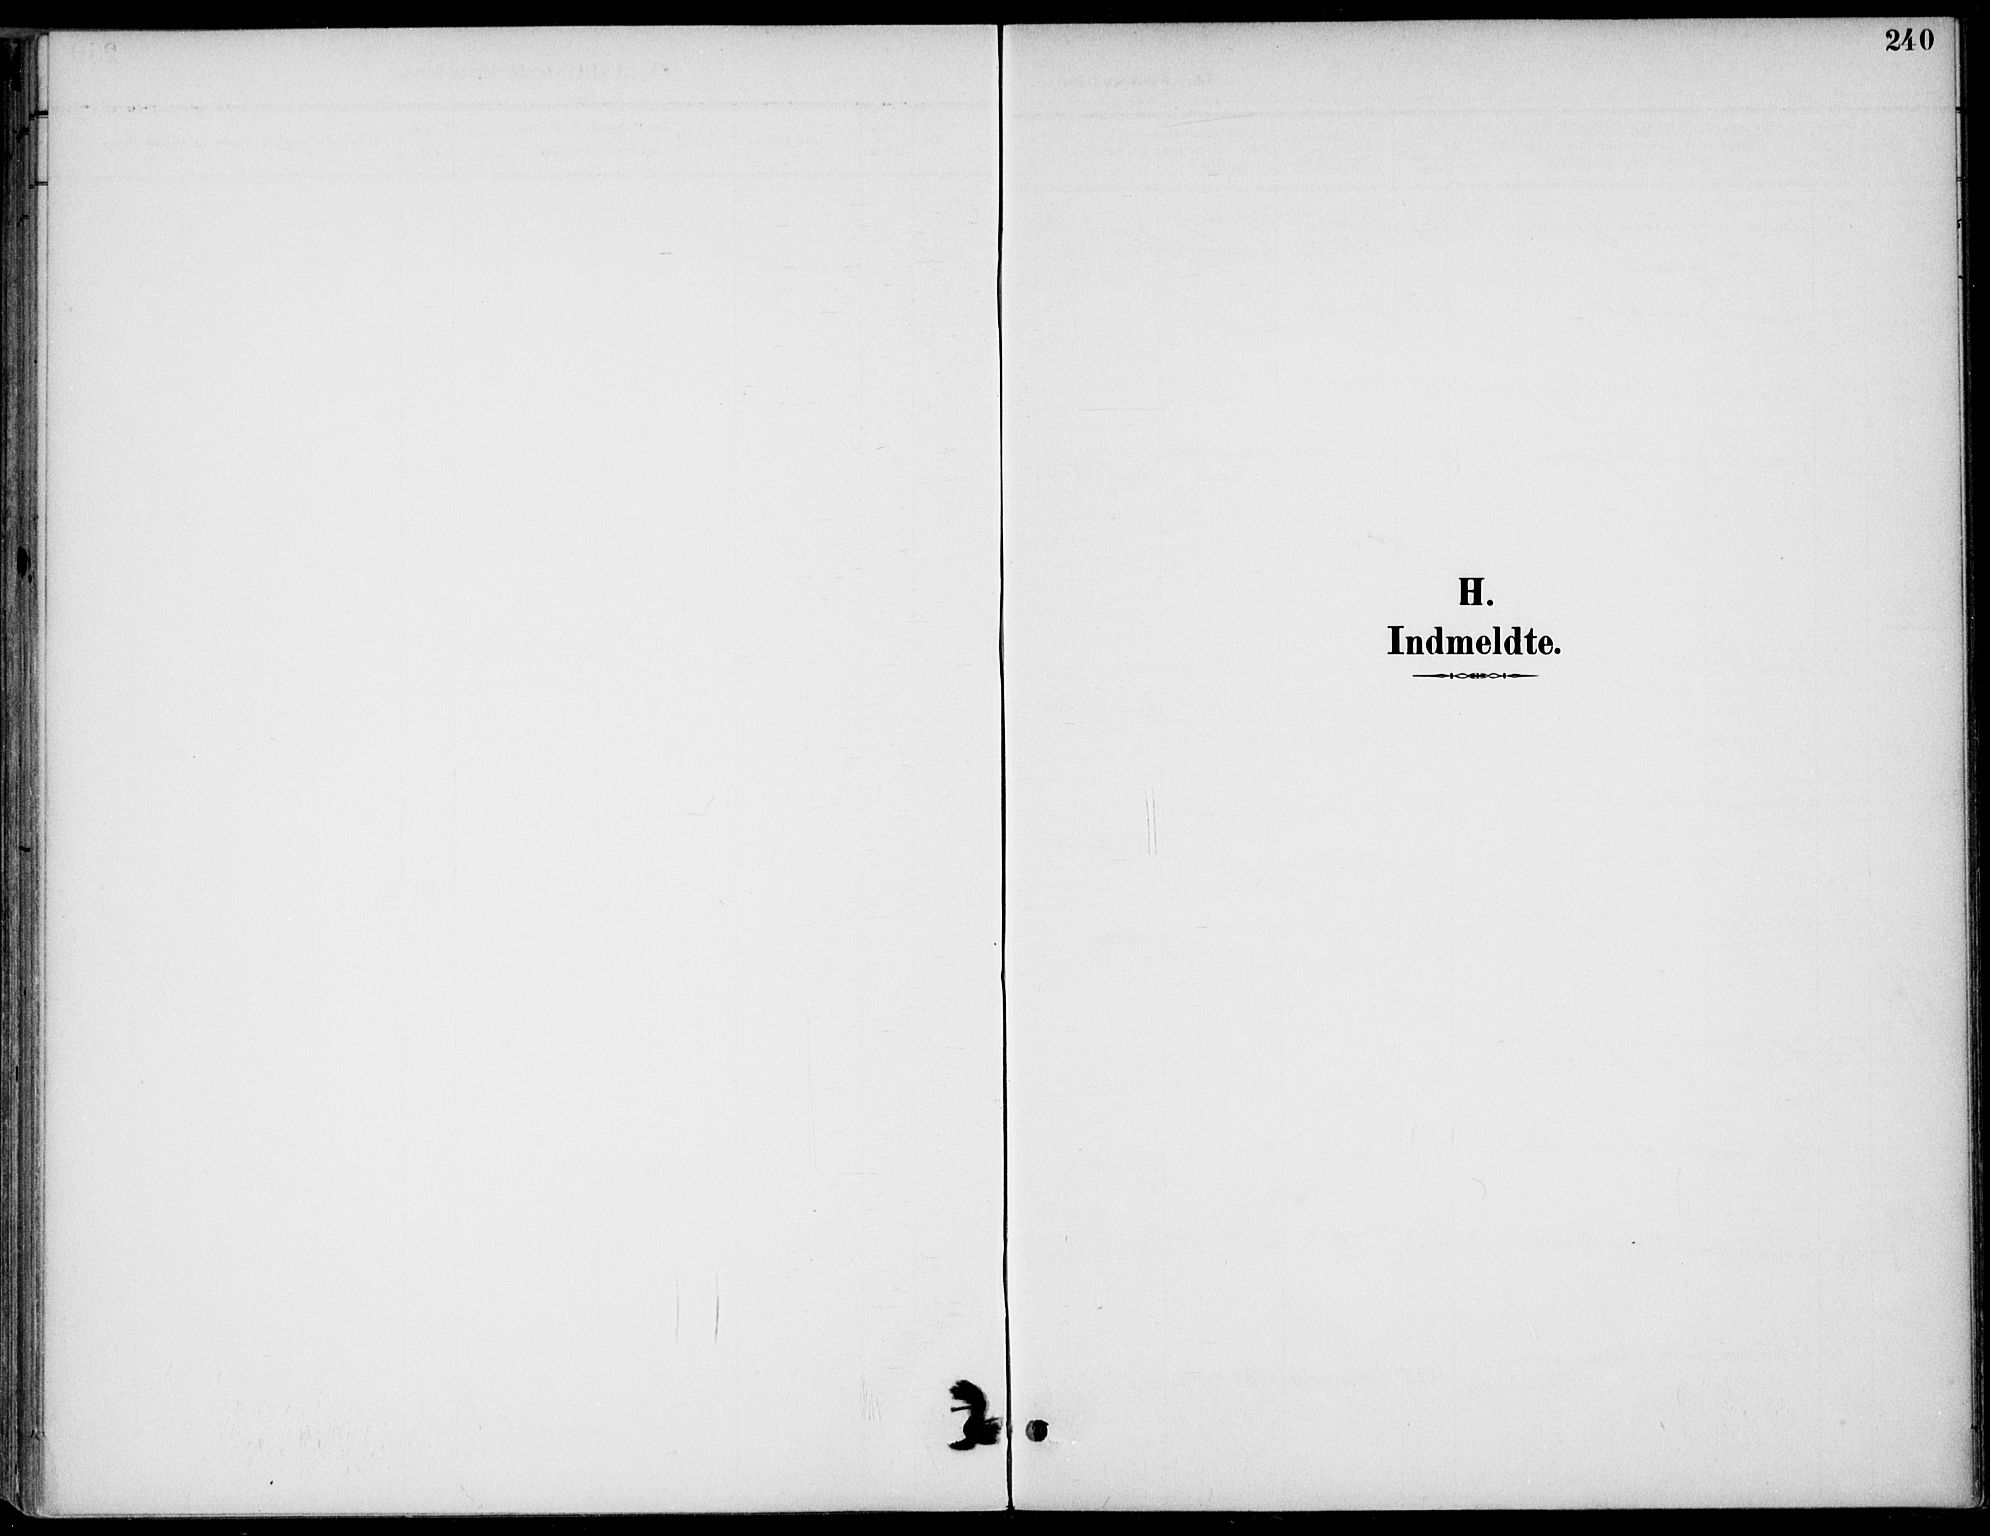 SAKO, Drangedal kirkebøker, F/Fa/L0012: Ministerialbok nr. 12, 1895-1905, s. 240